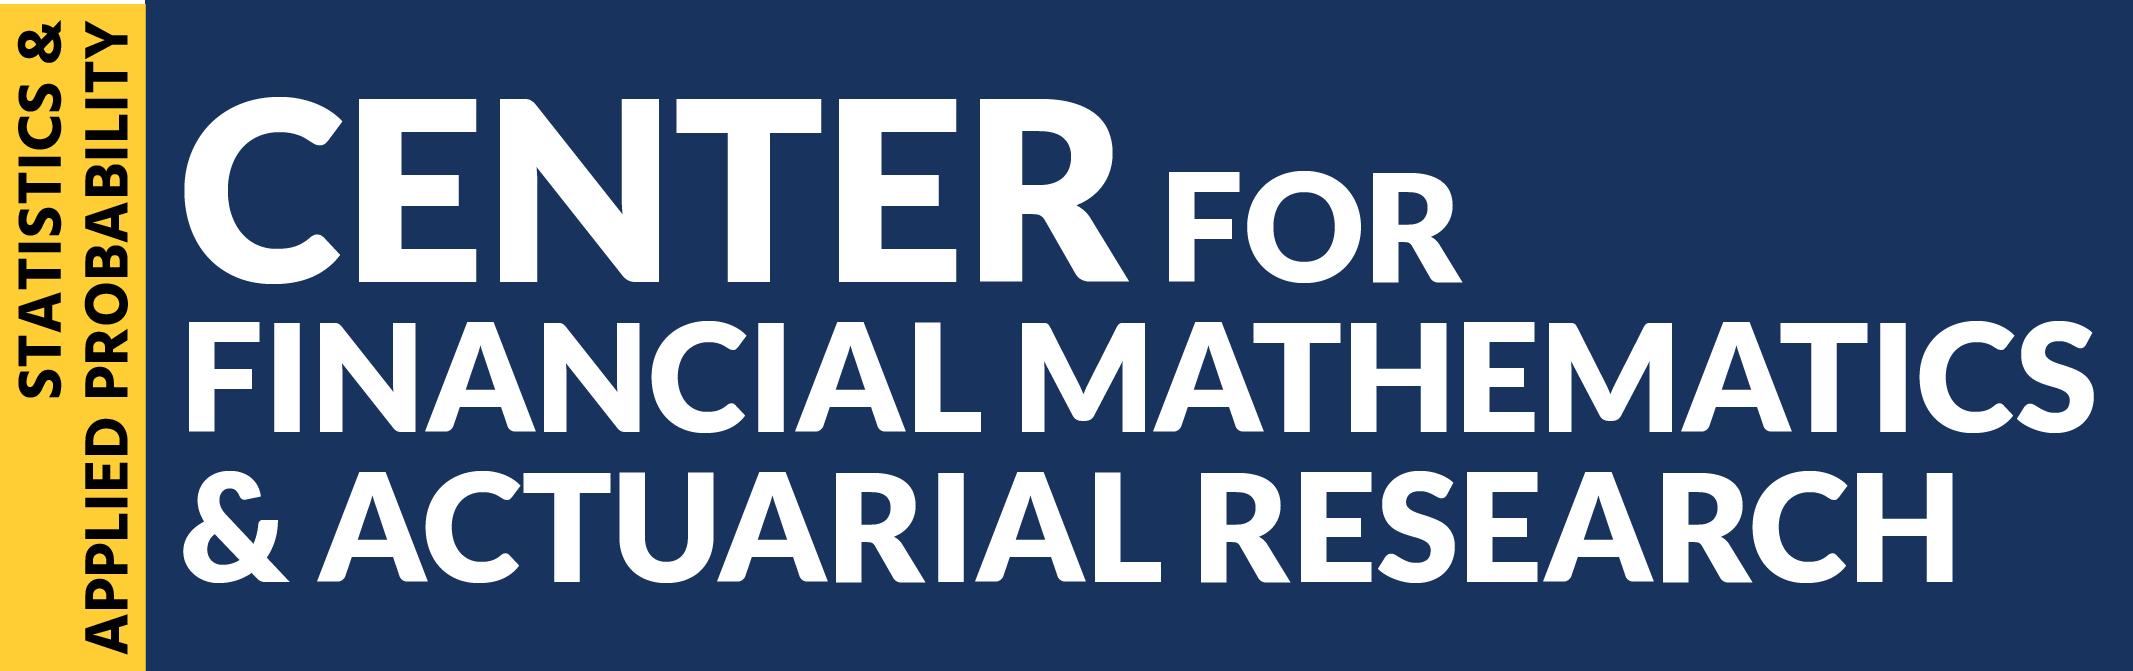 Center for Financial Mathematics and Actuarial Research - UC Santa Barbara